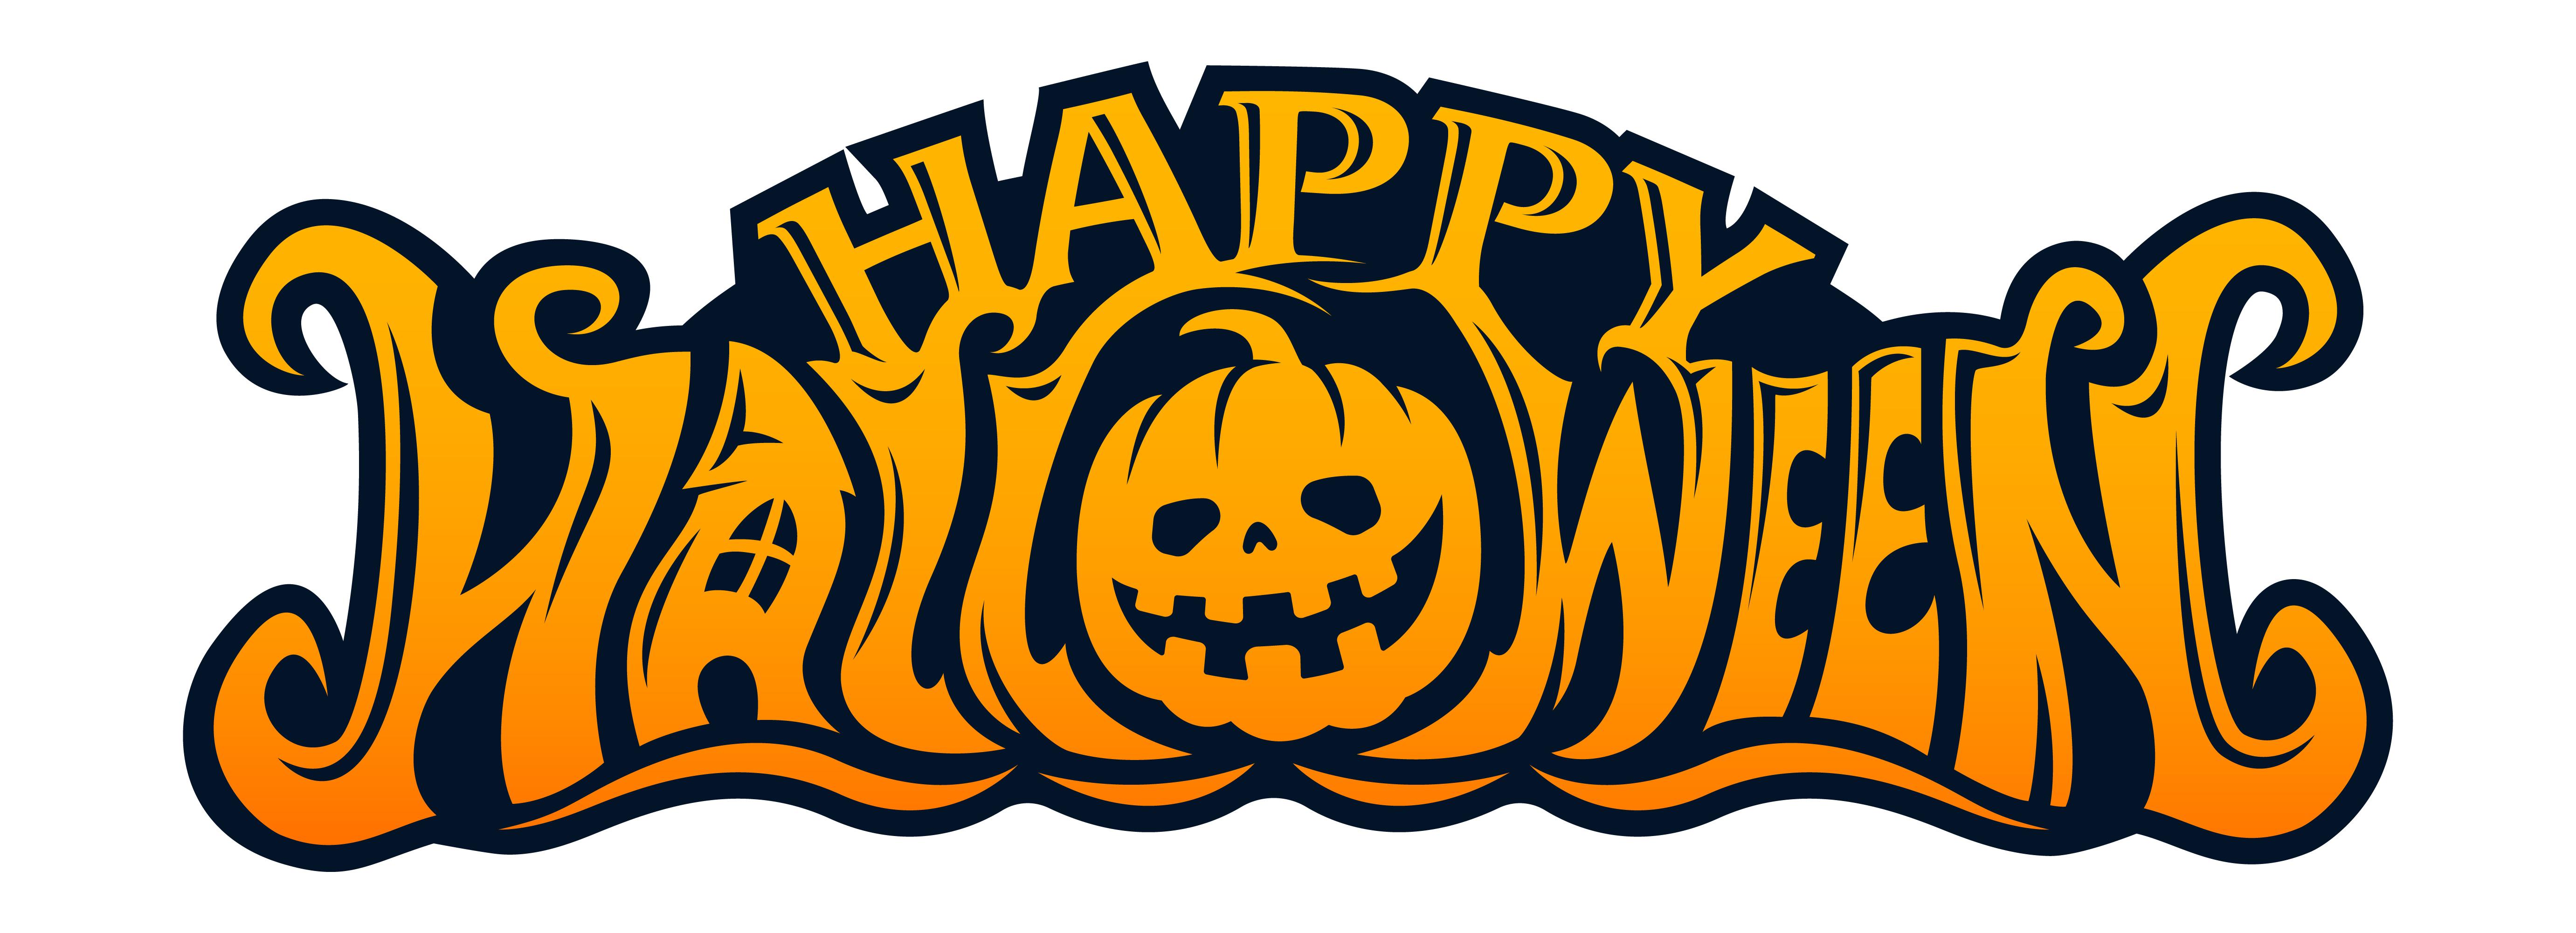 Happy Halloween Pumpkin Head Text Design Download Free Vectors Clipart Graphics Vector Art